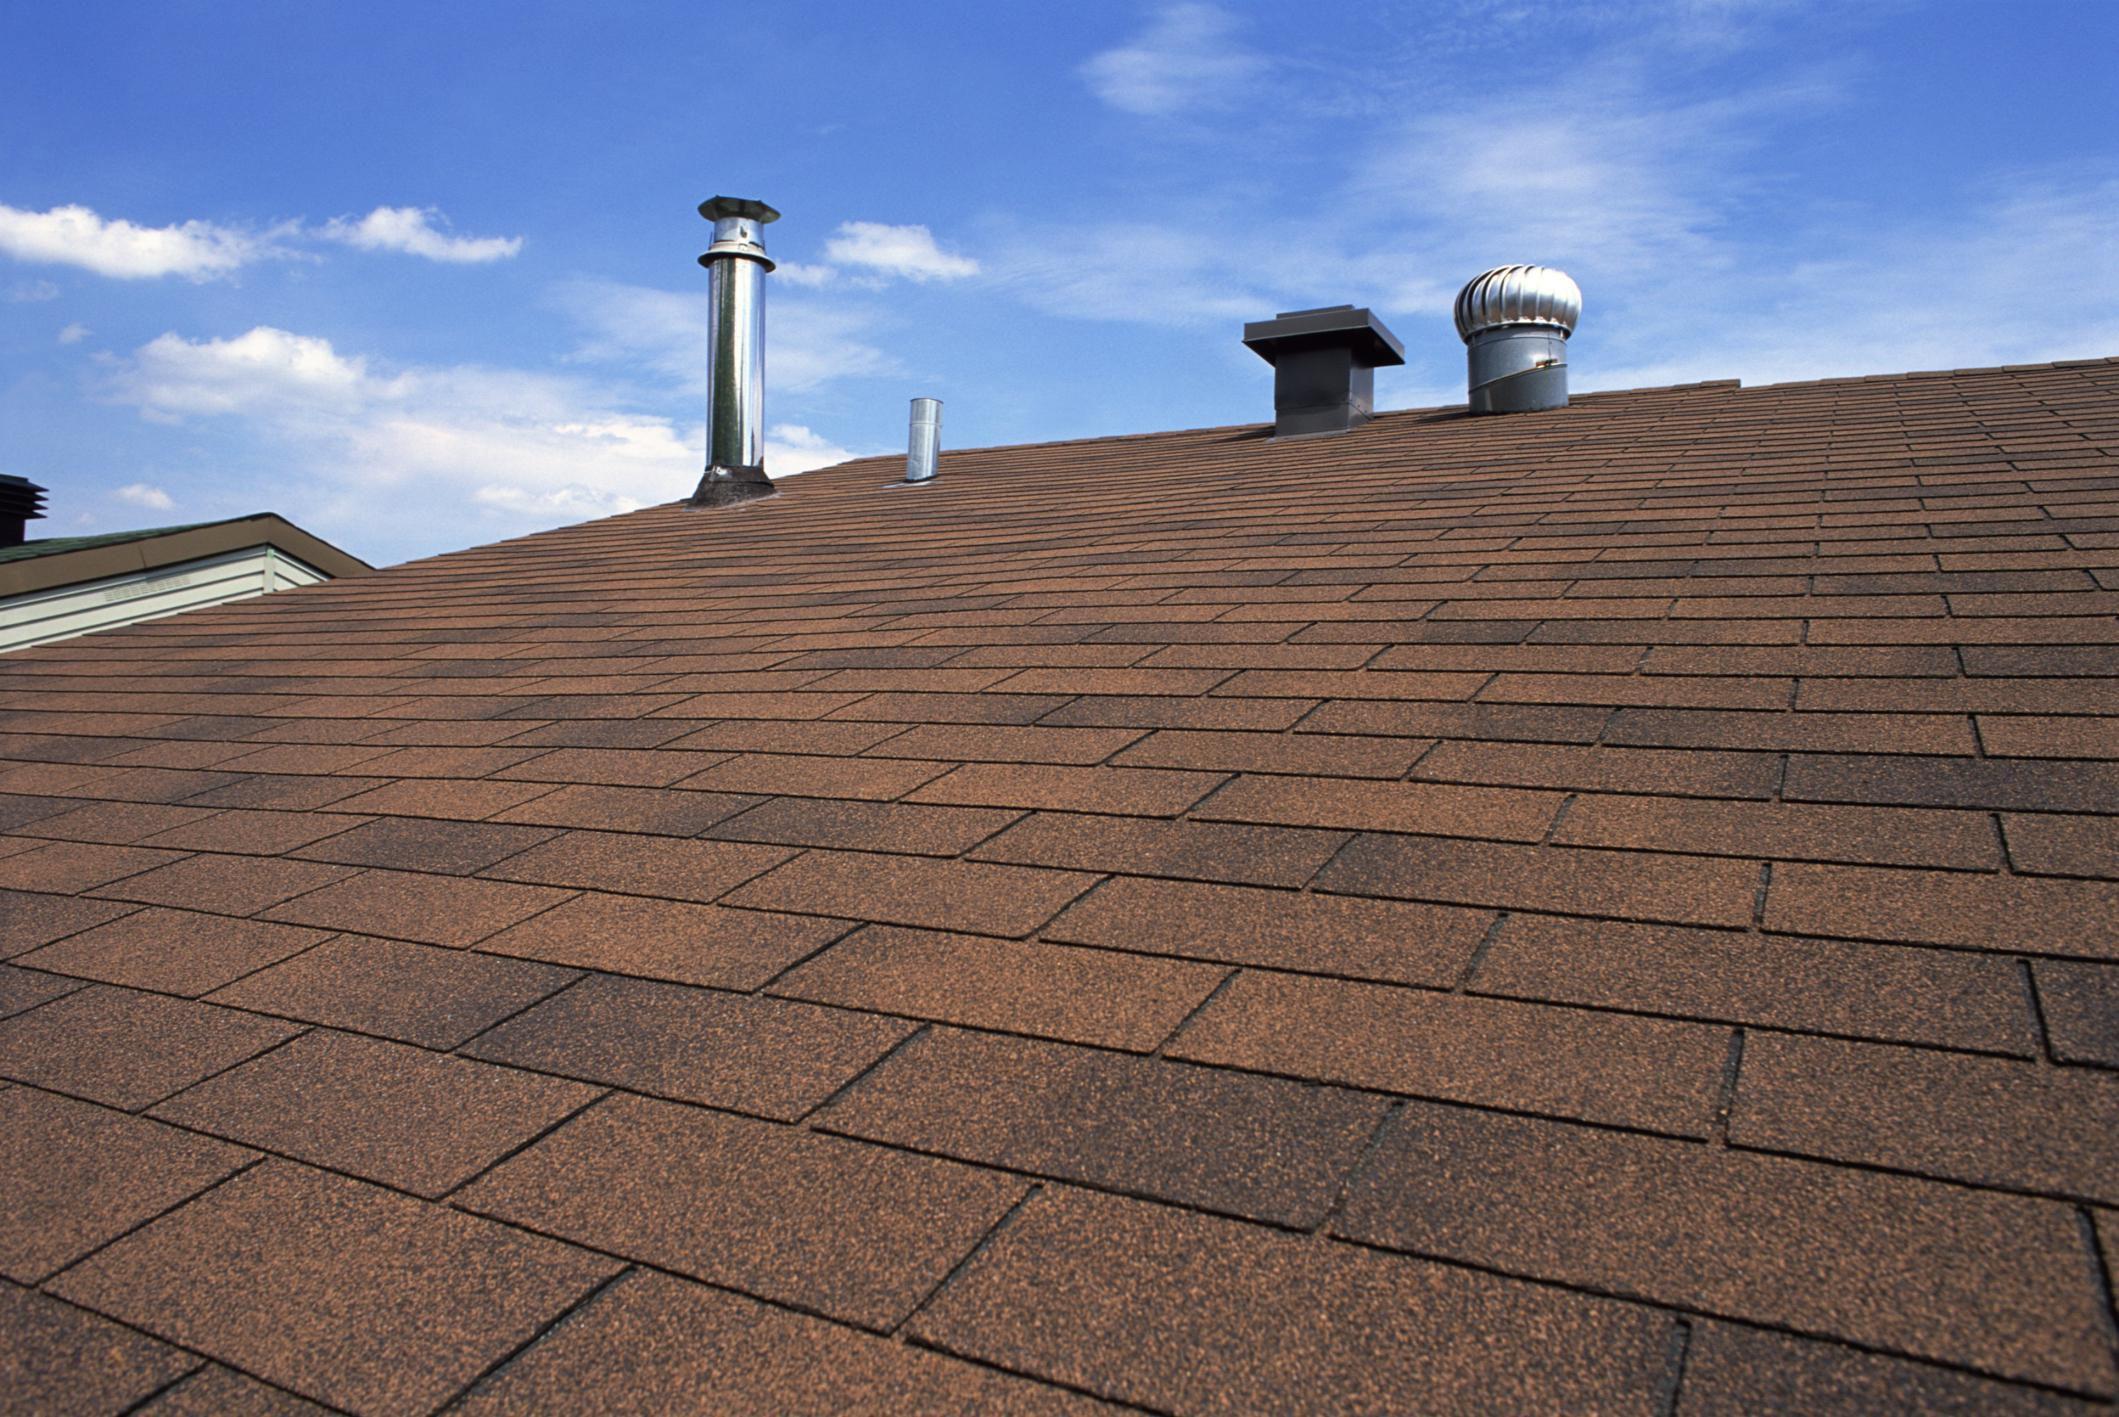 How To Repair A Built Up Asphalt Flat Roof